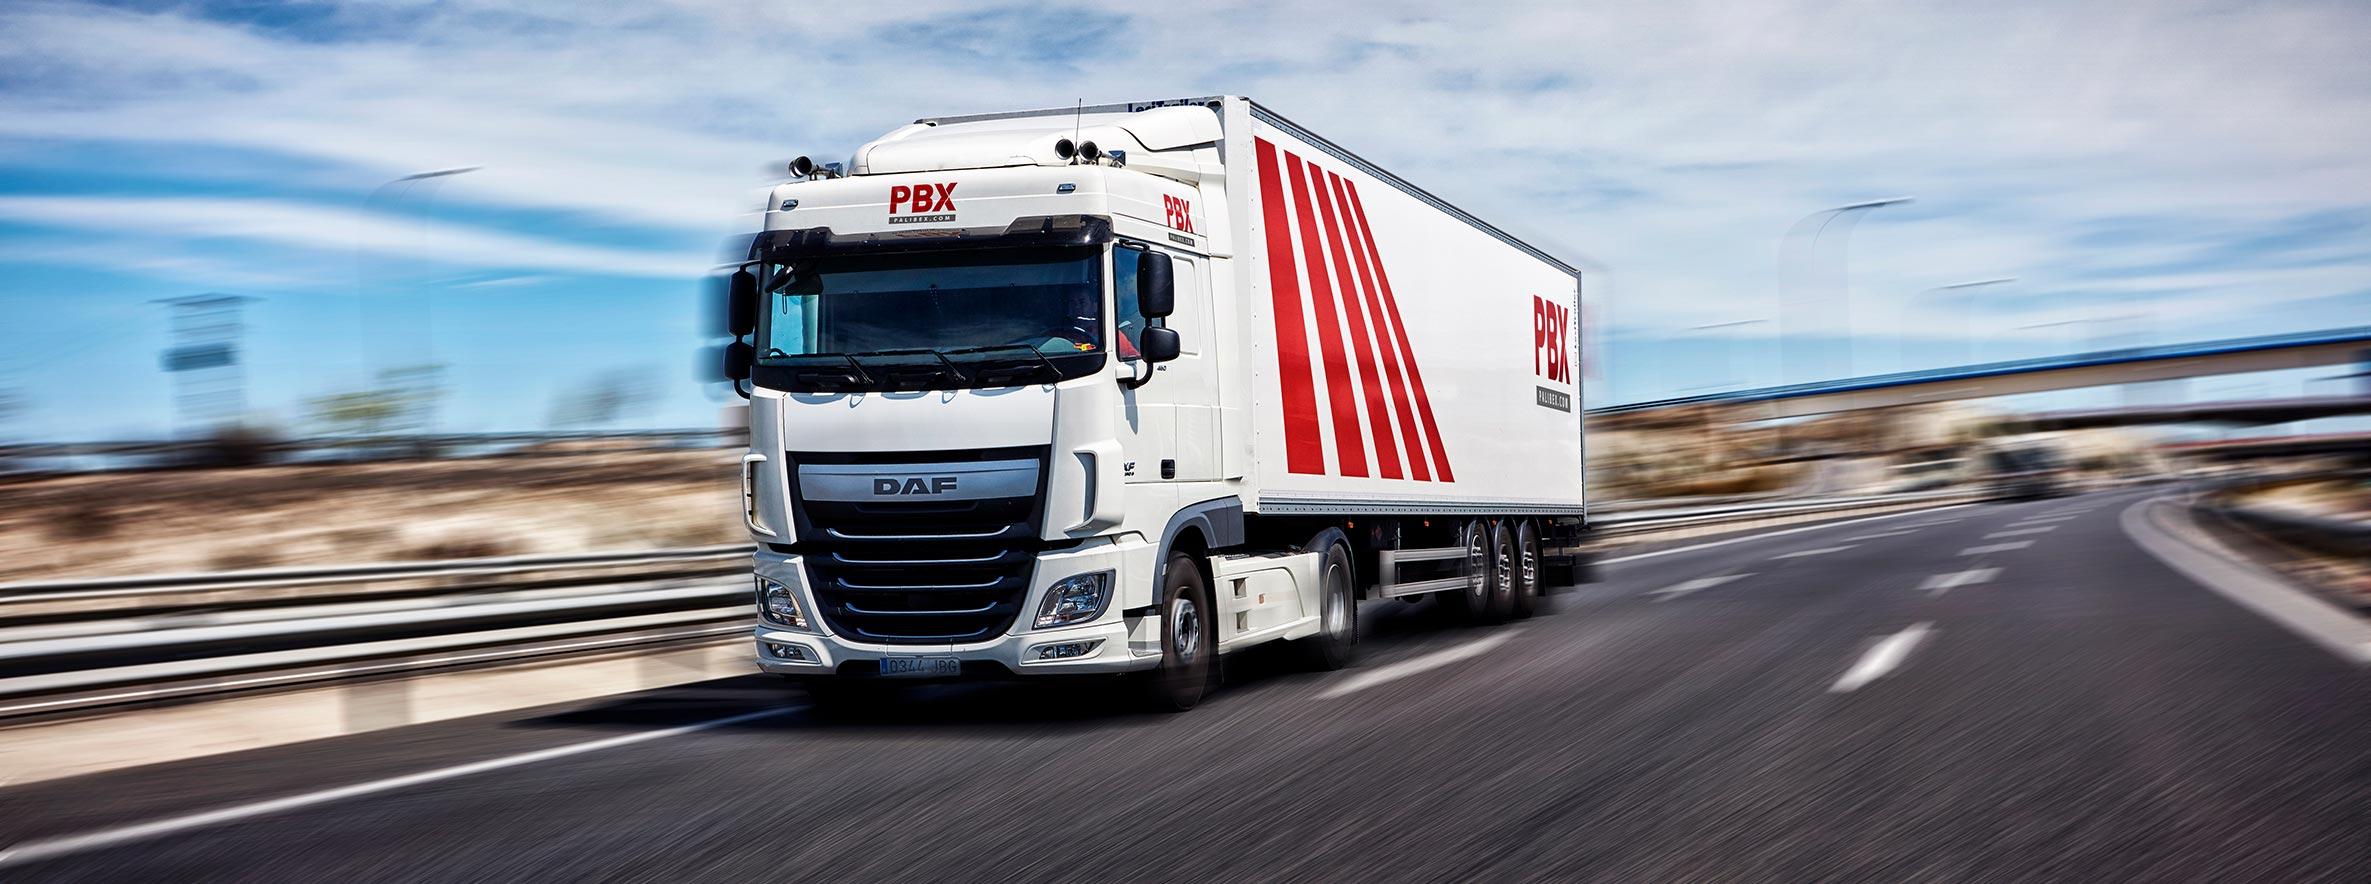 servicio ltl palibex - gran consumo - camion